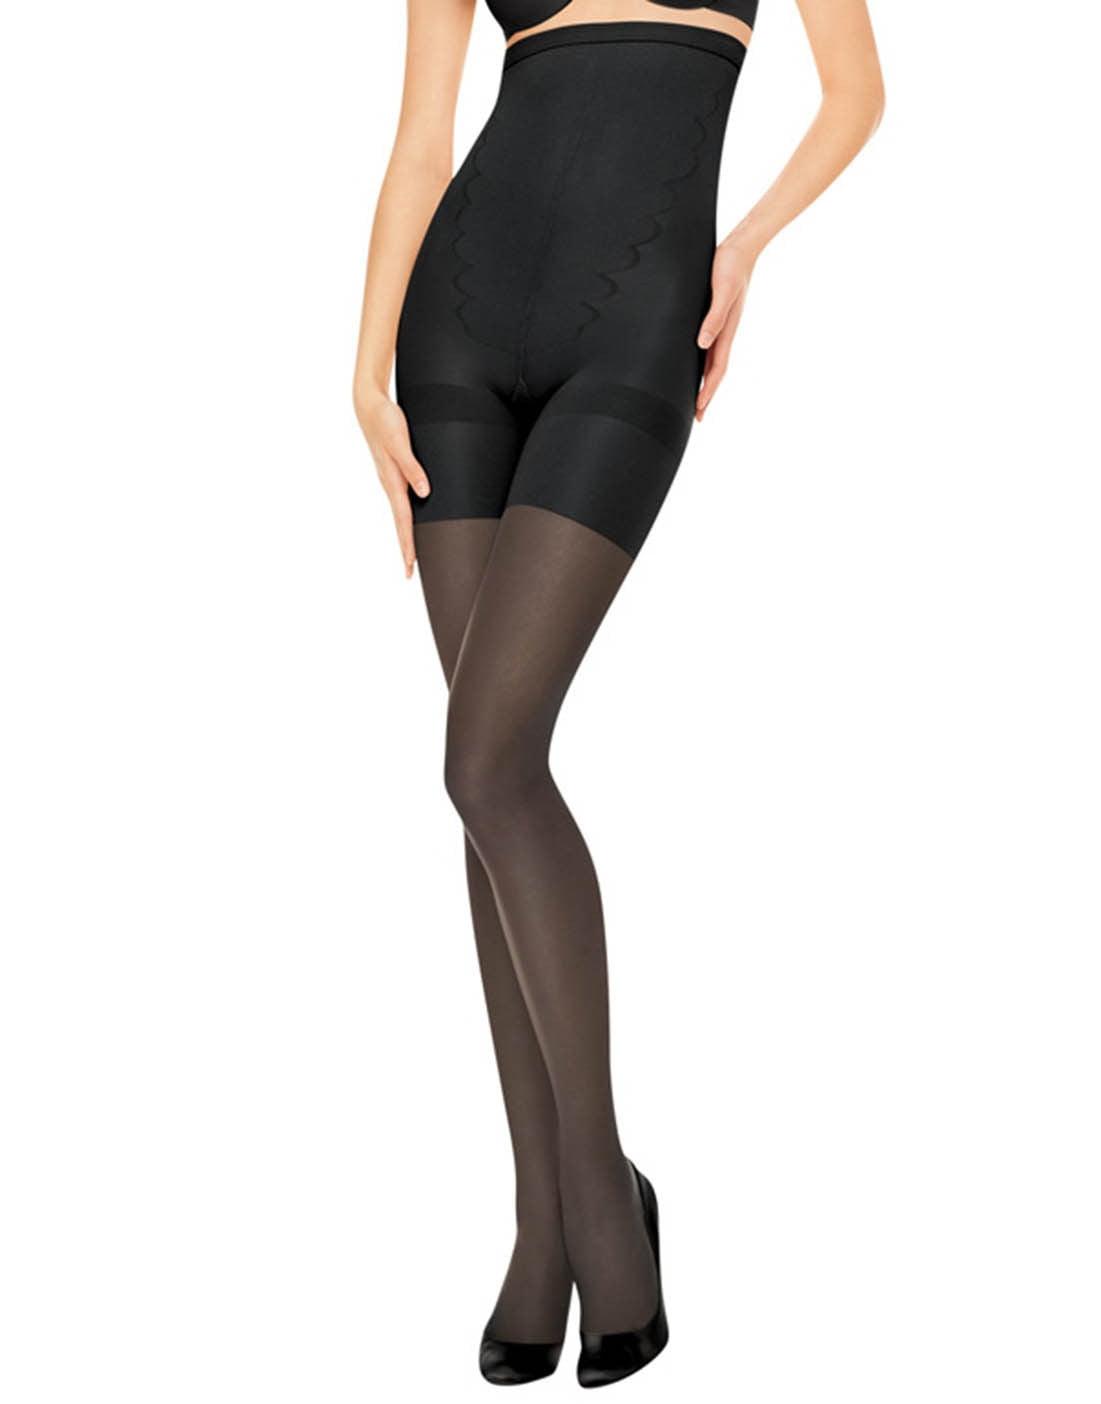 6e5b2ce9dc7 Assets - SPANX Assets 1845 Plus Size High Waist Sheers Firm Tummy Control  Pantyhose - Walmart.com